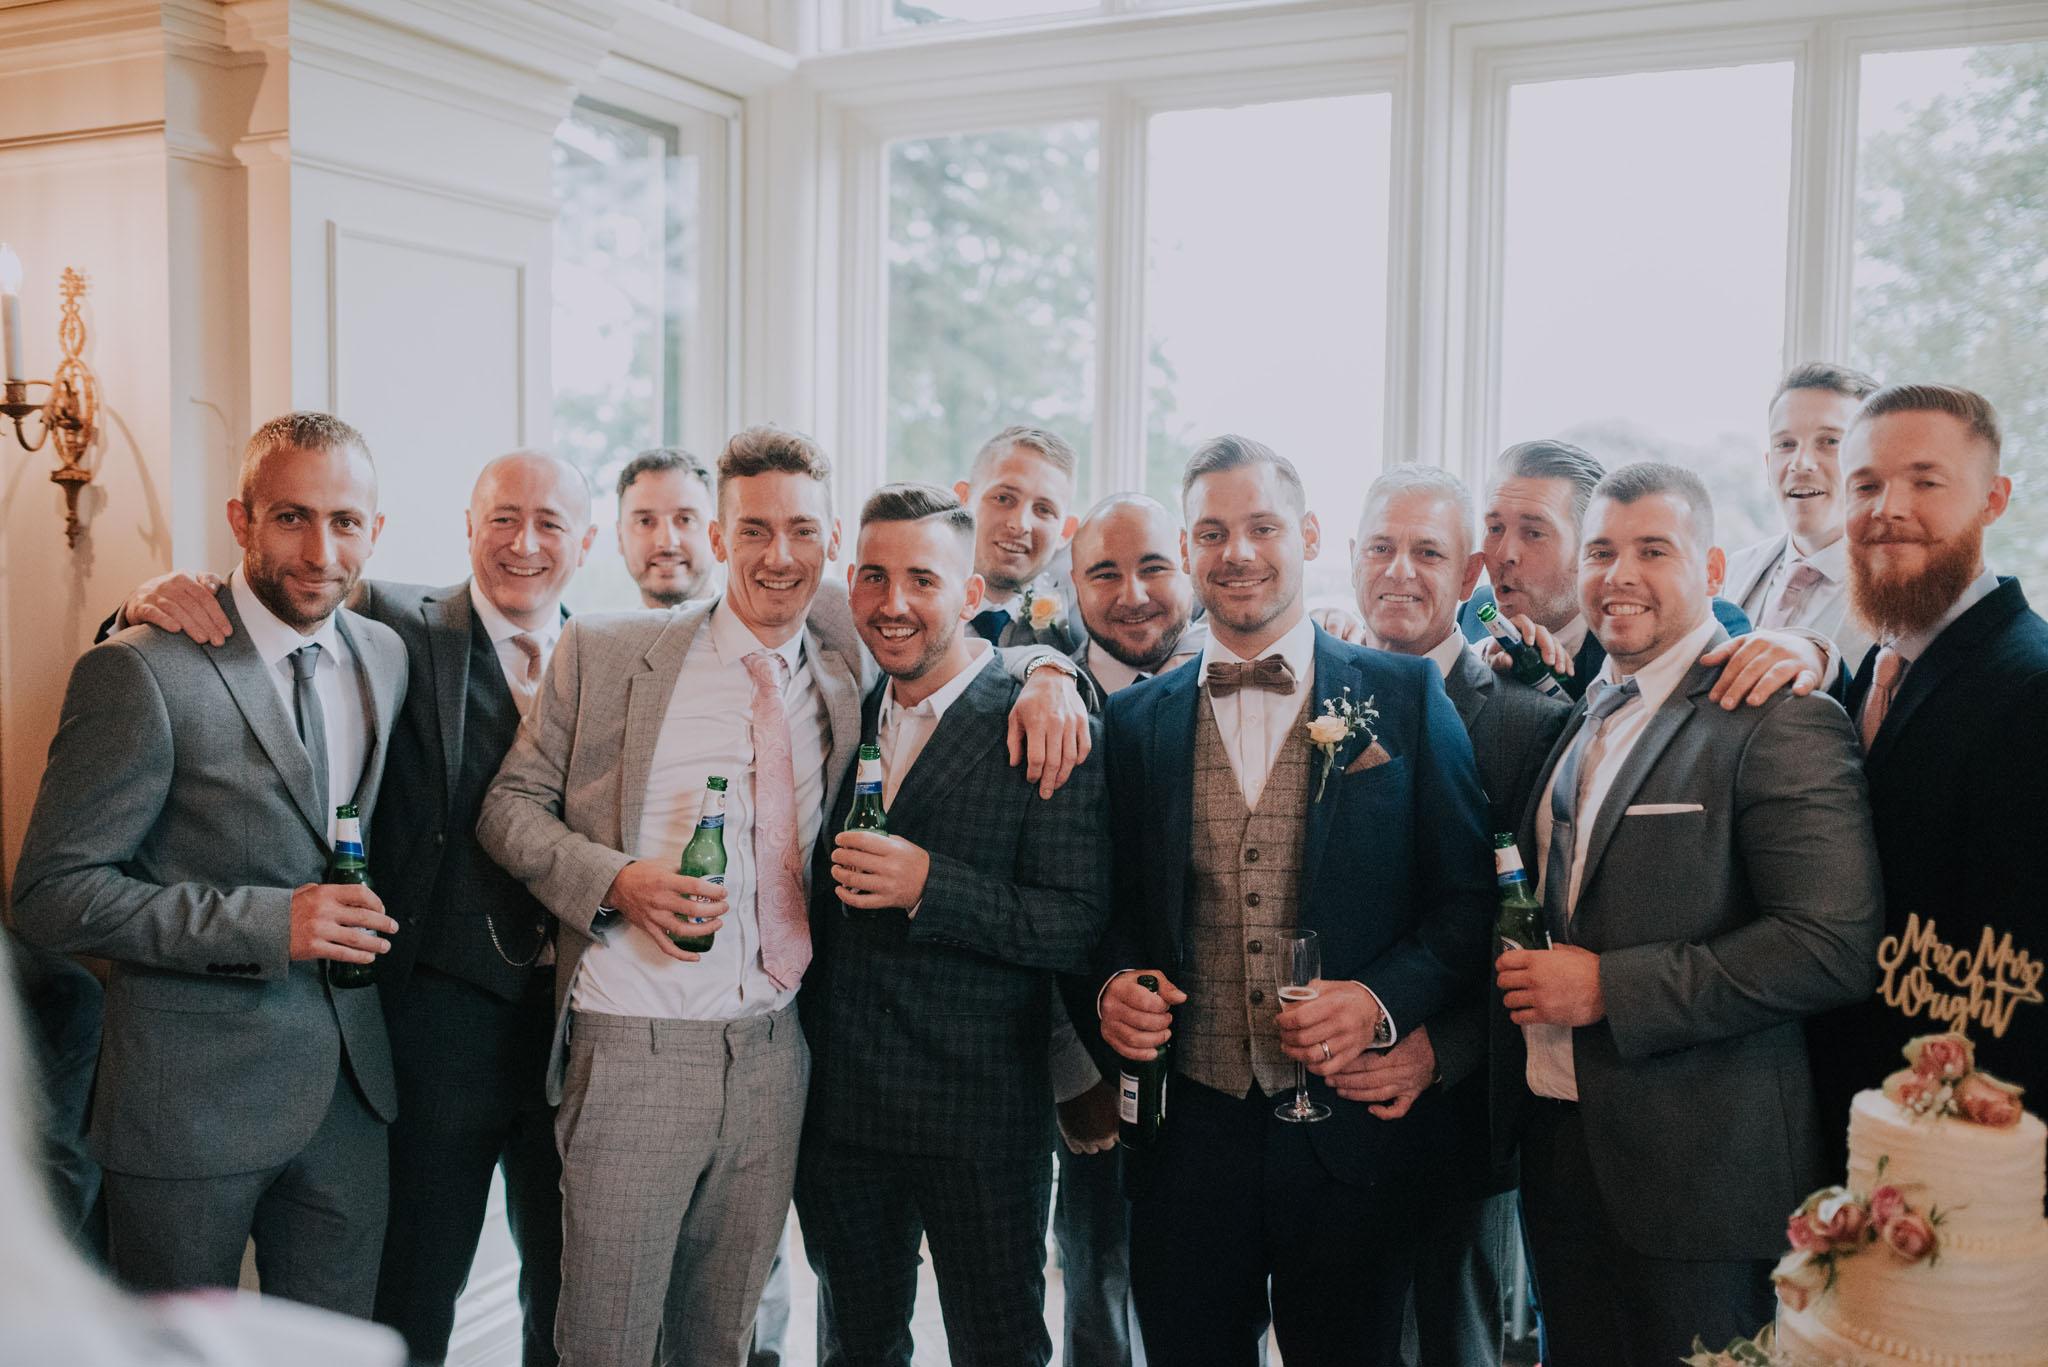 wedding-photographer-glewstone-court-hereford-scott-stockwell-photography320.jpg